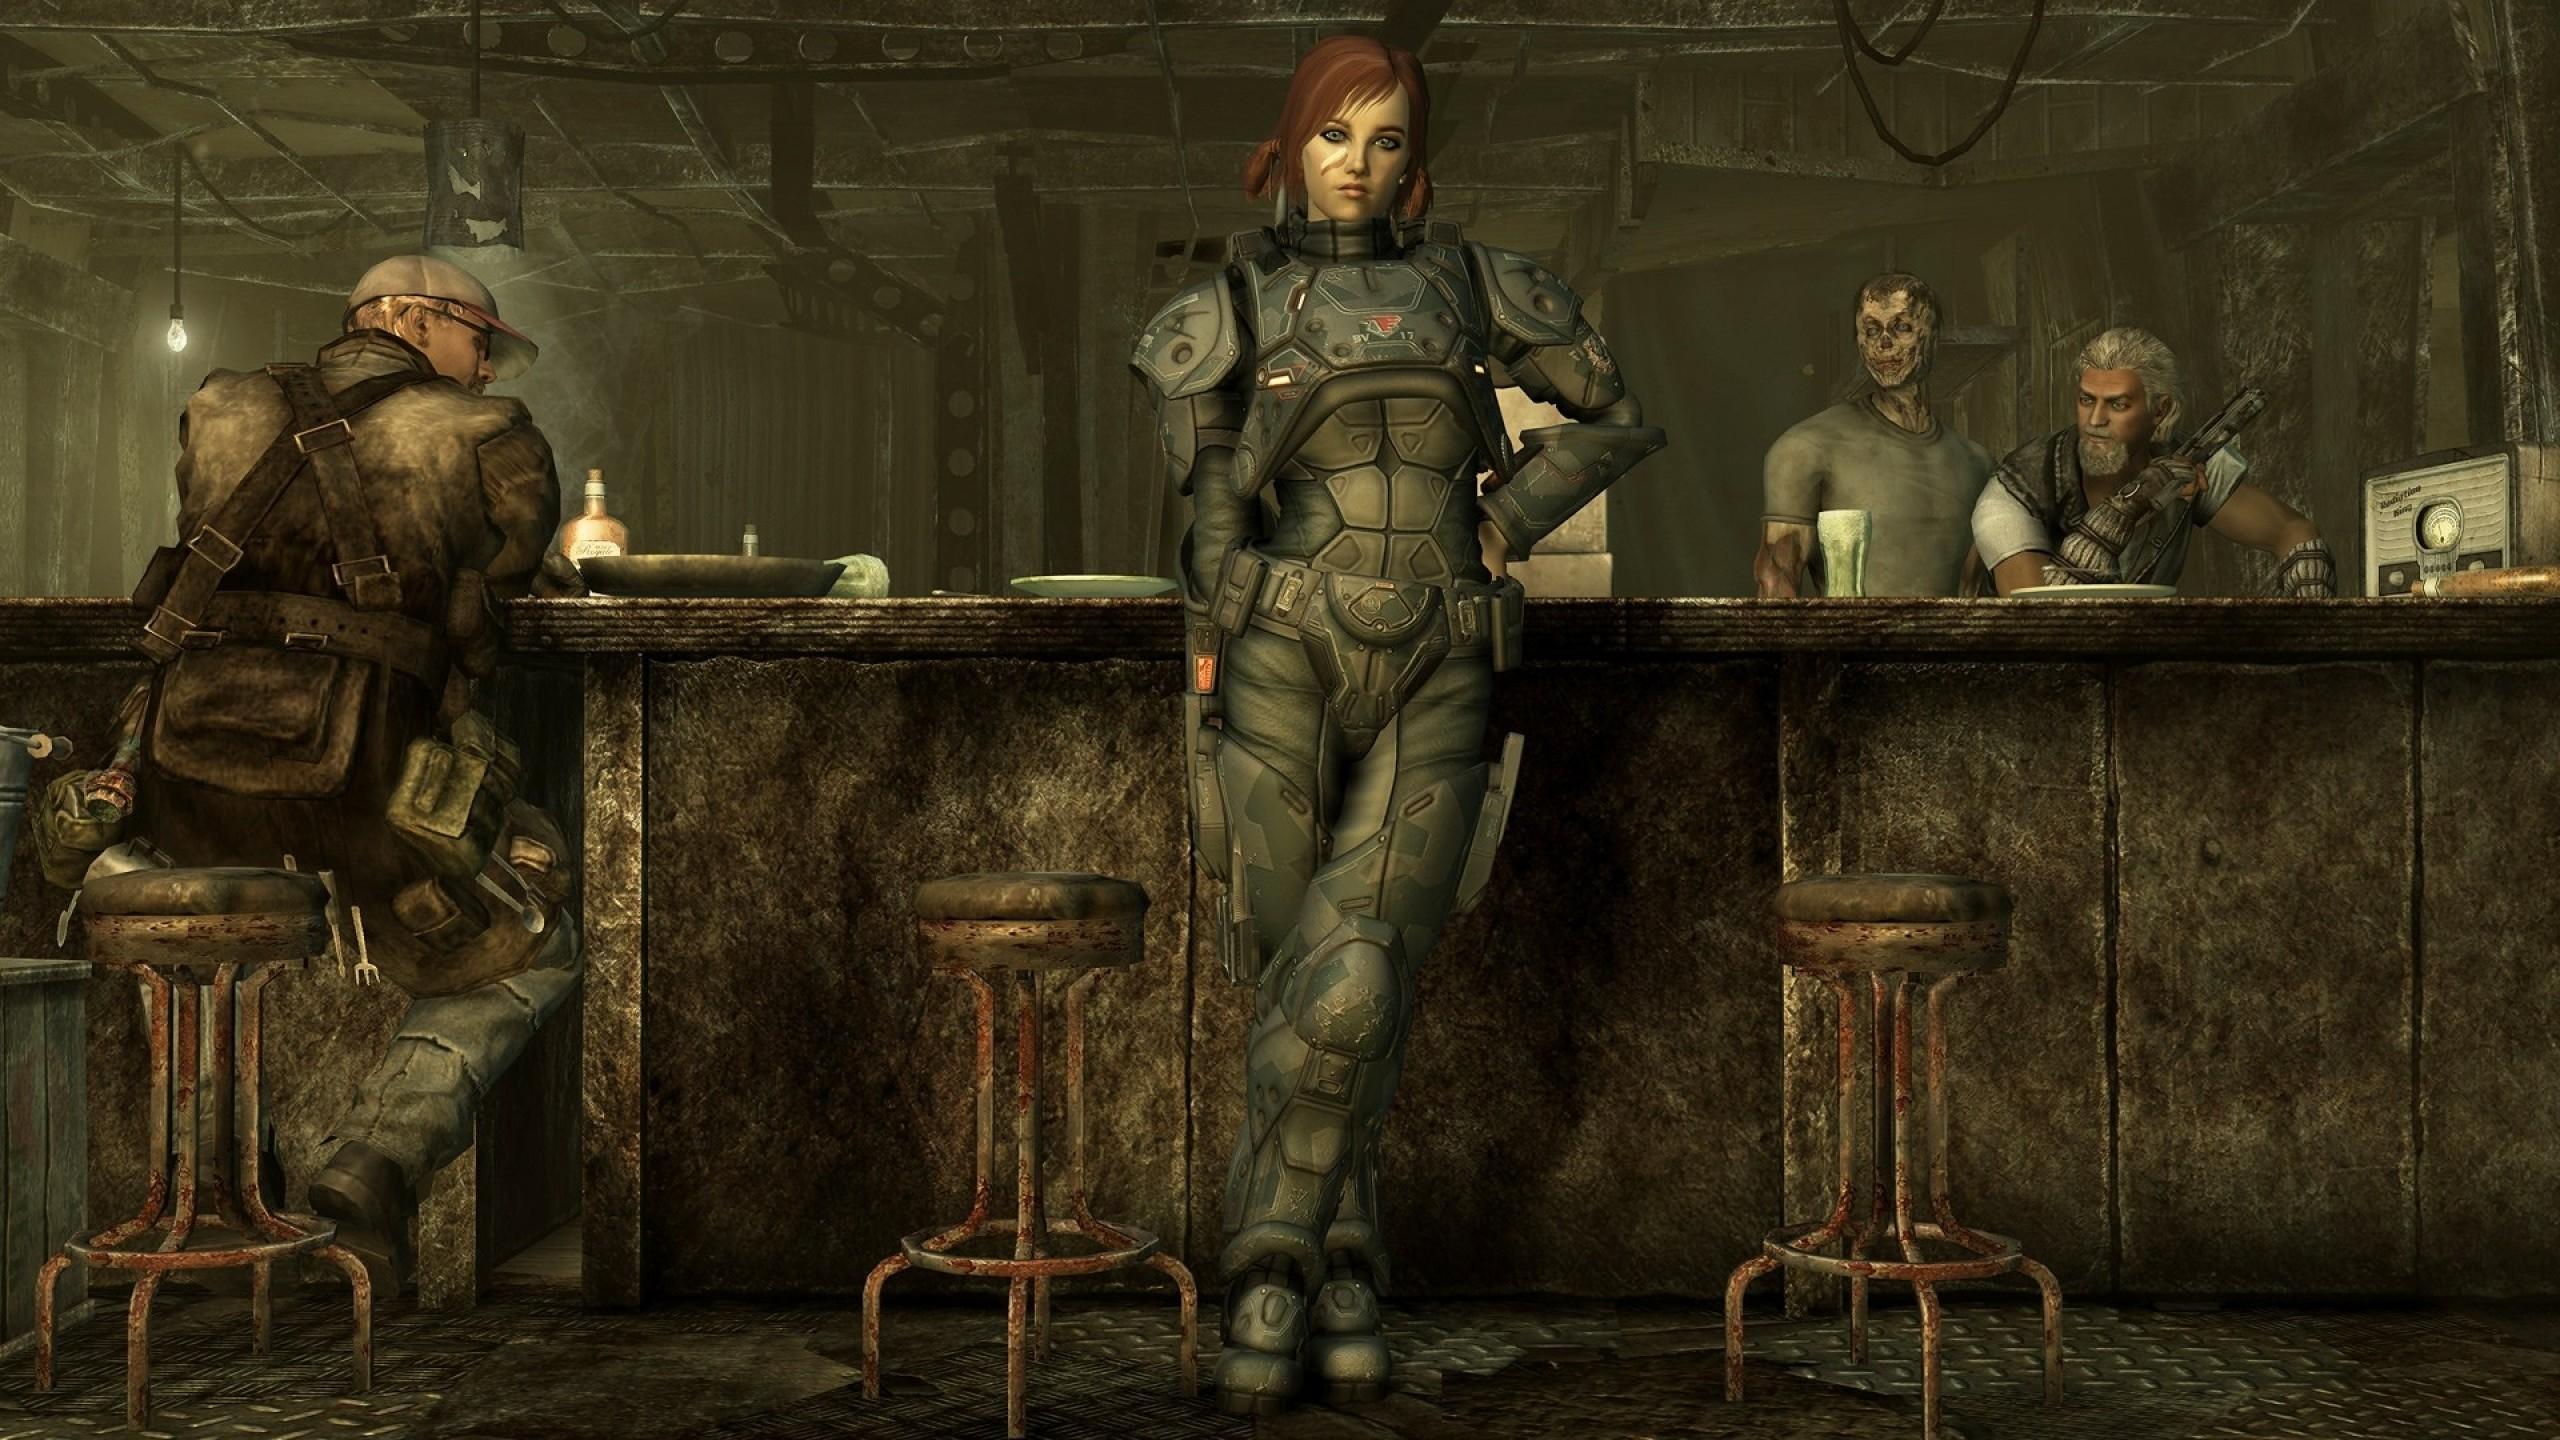 2560x1440 wallpaper.wiki-Video-Game-Fallout-3-Wallpapers-HD